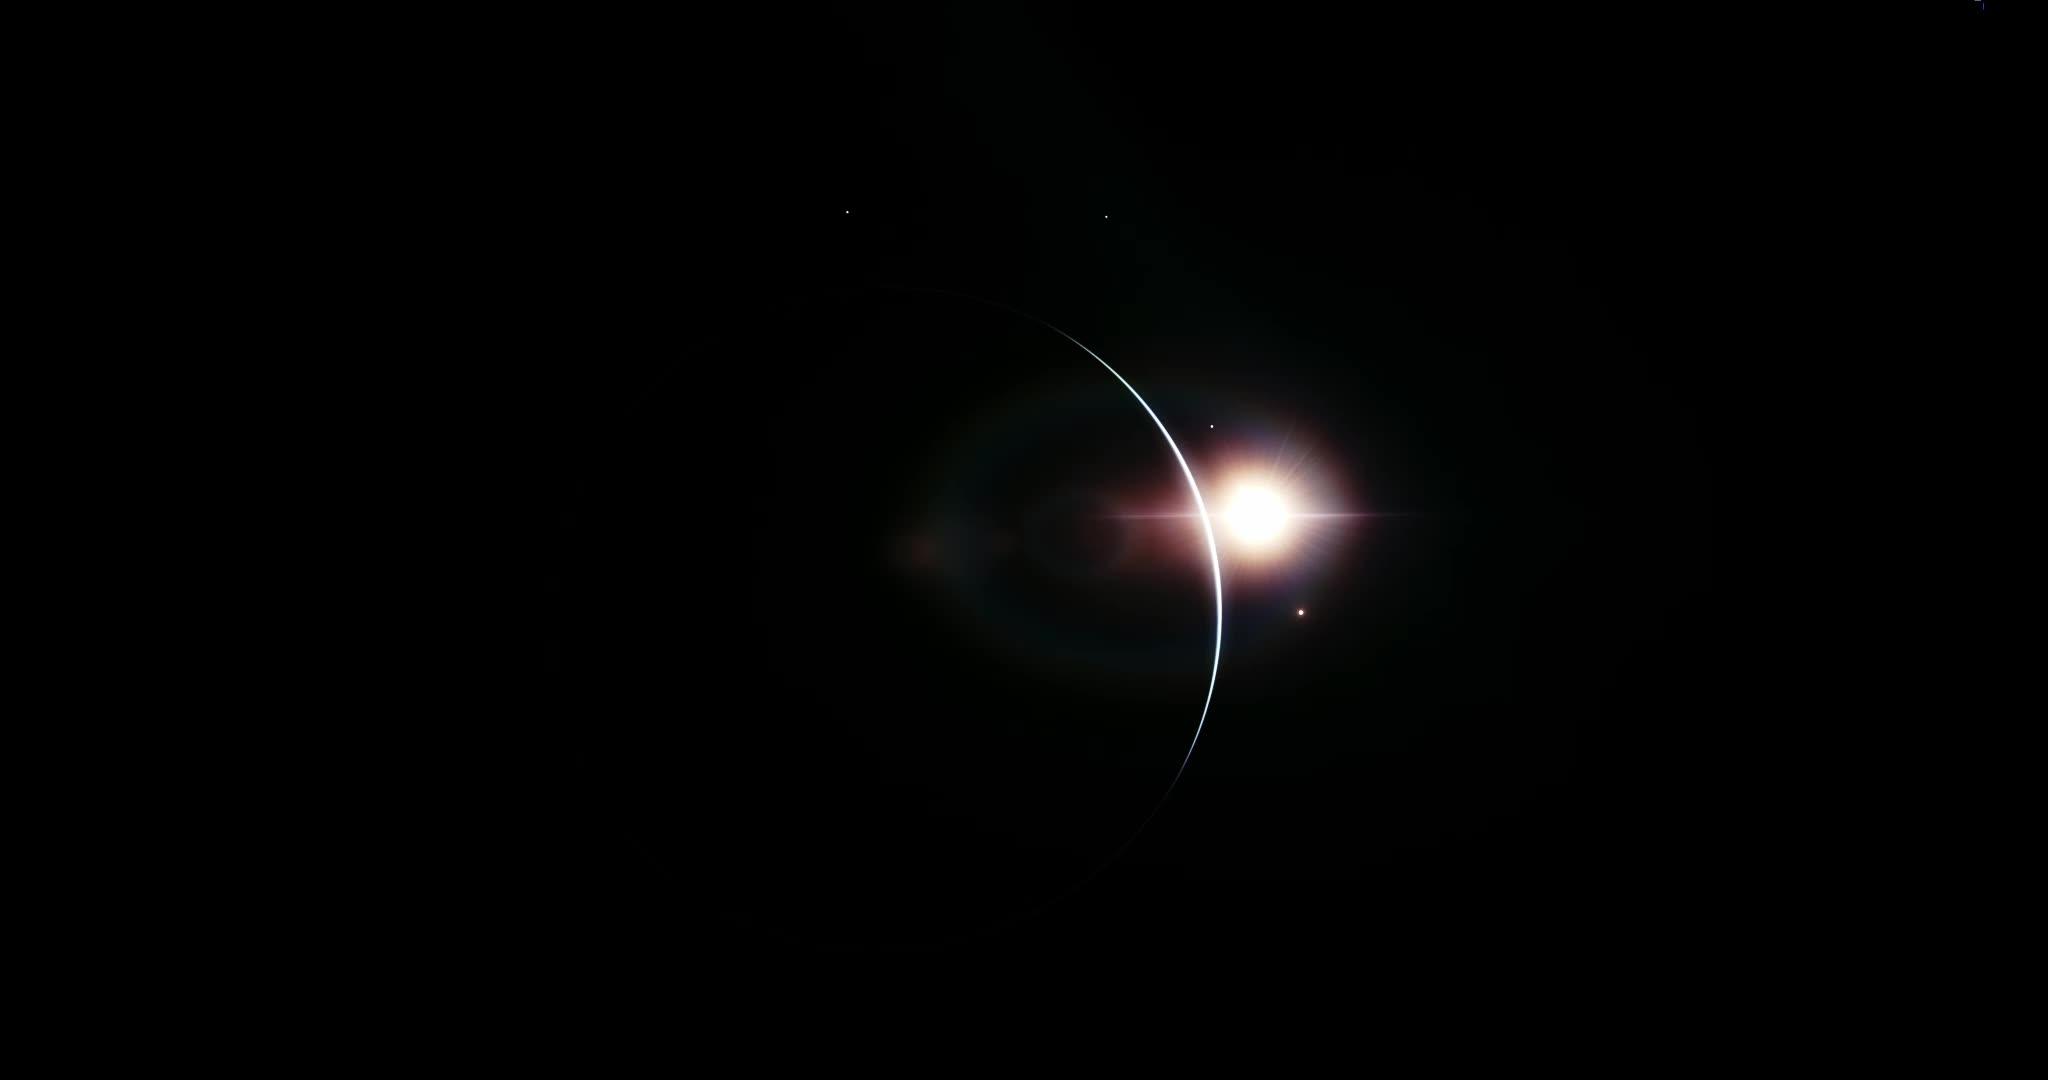 spaceengine, Space Engine Stuff GIFs